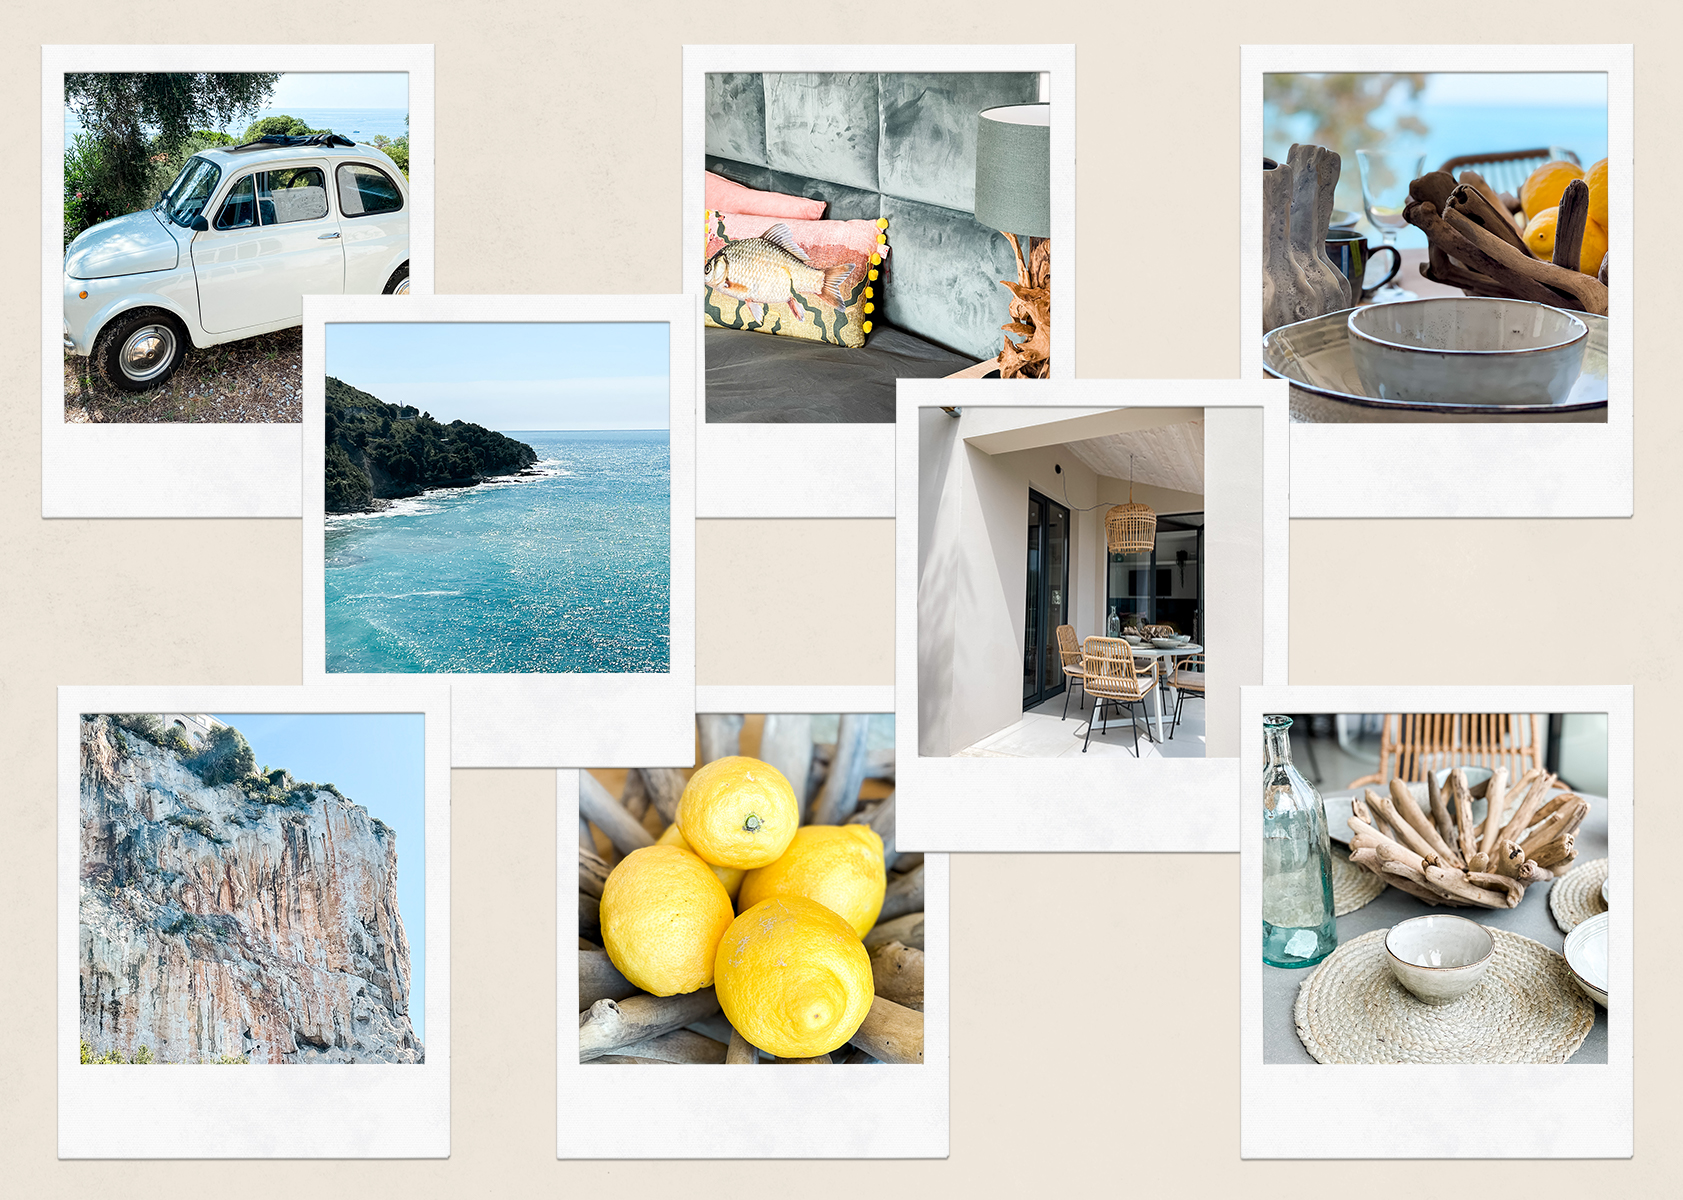 Balzi rossi holiday resort italy